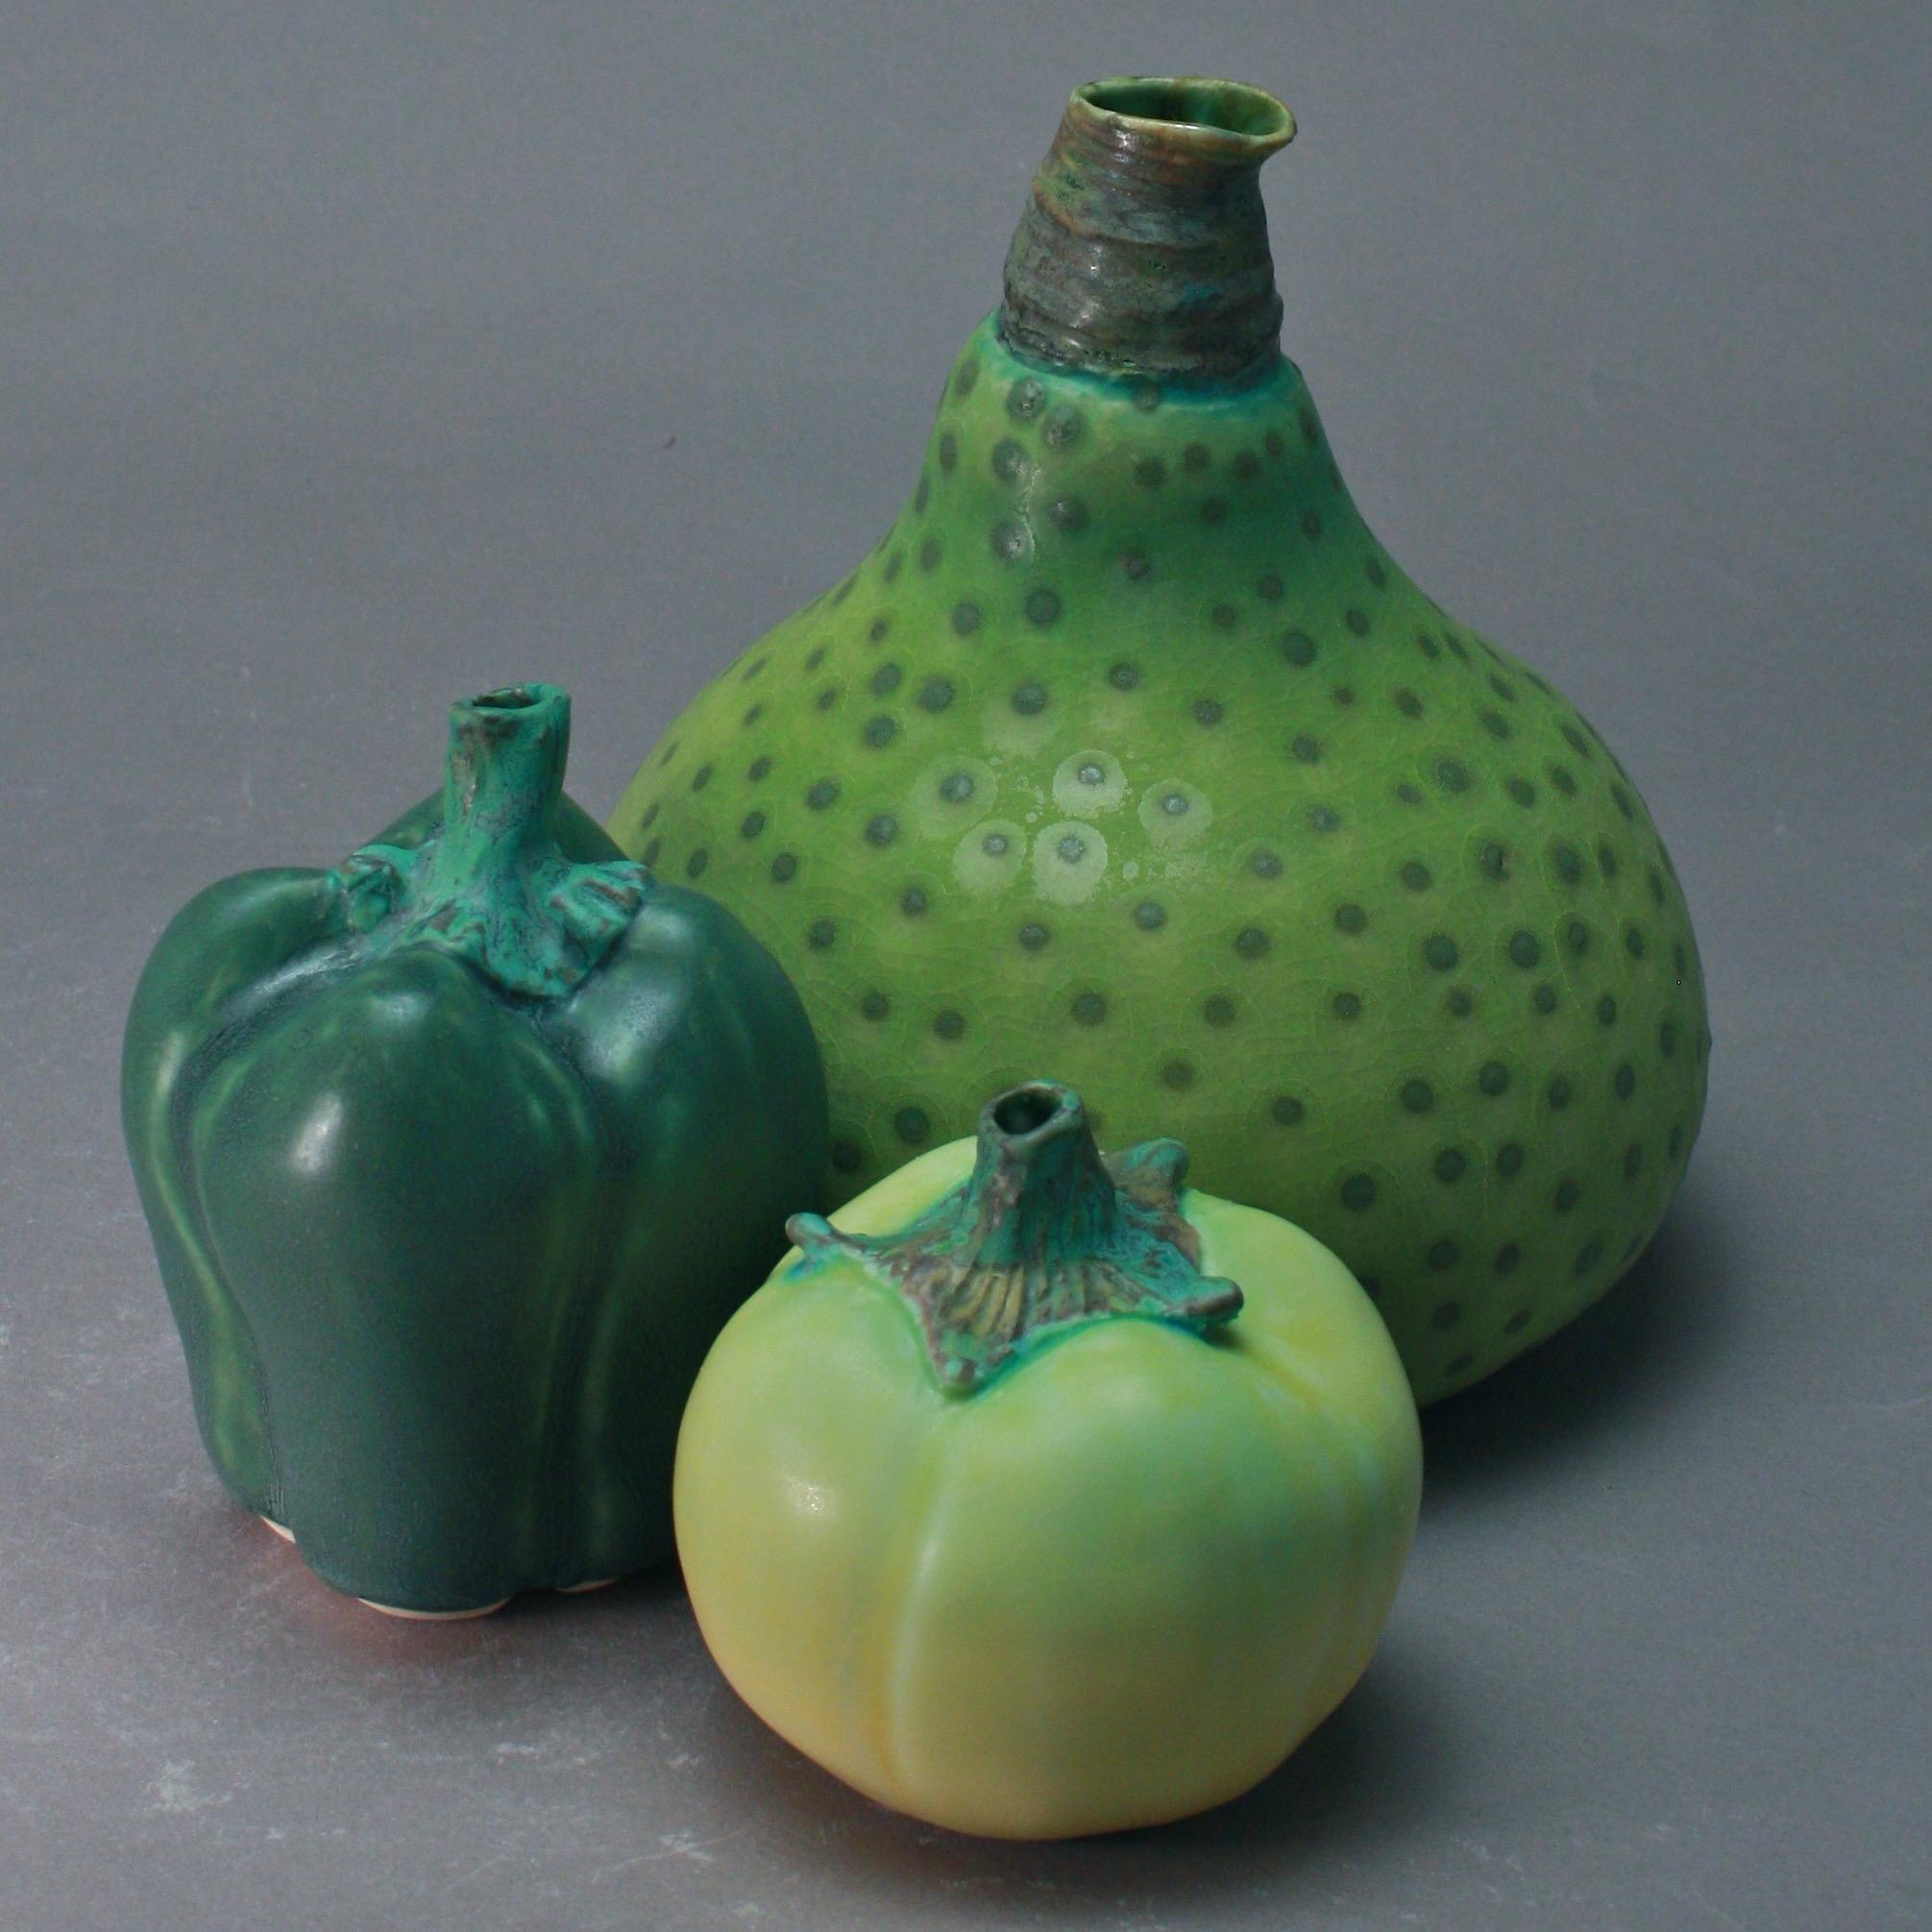 FV-11 | Yellow Tomato, Green Pepper, Green Gourd ($50-75)